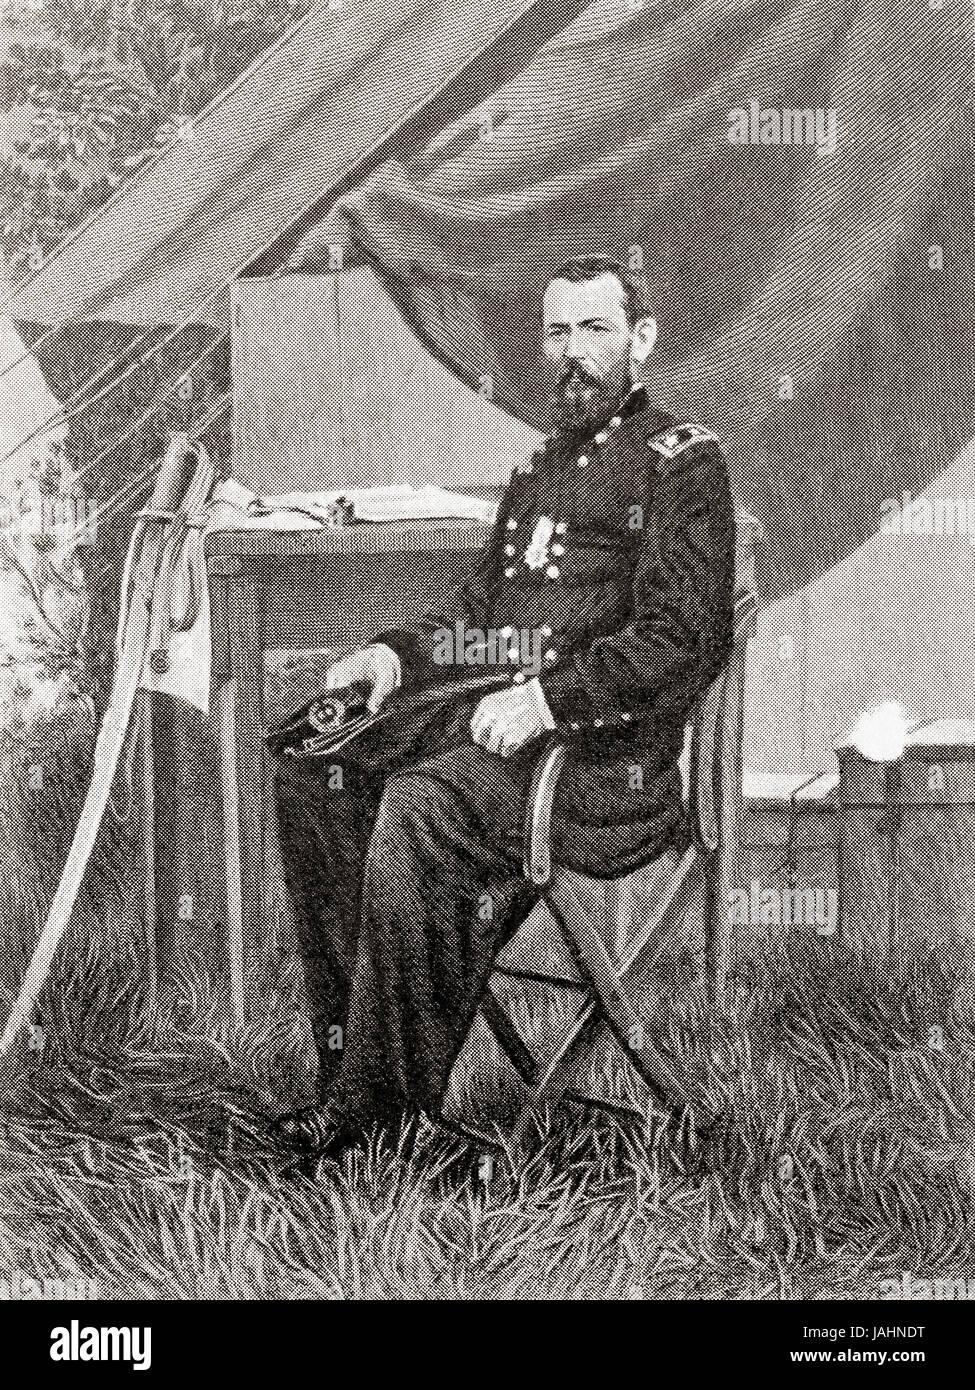 Art 1862 Dated Antique Print Ambrose Burnside Union Army General American Civil War Selected Material